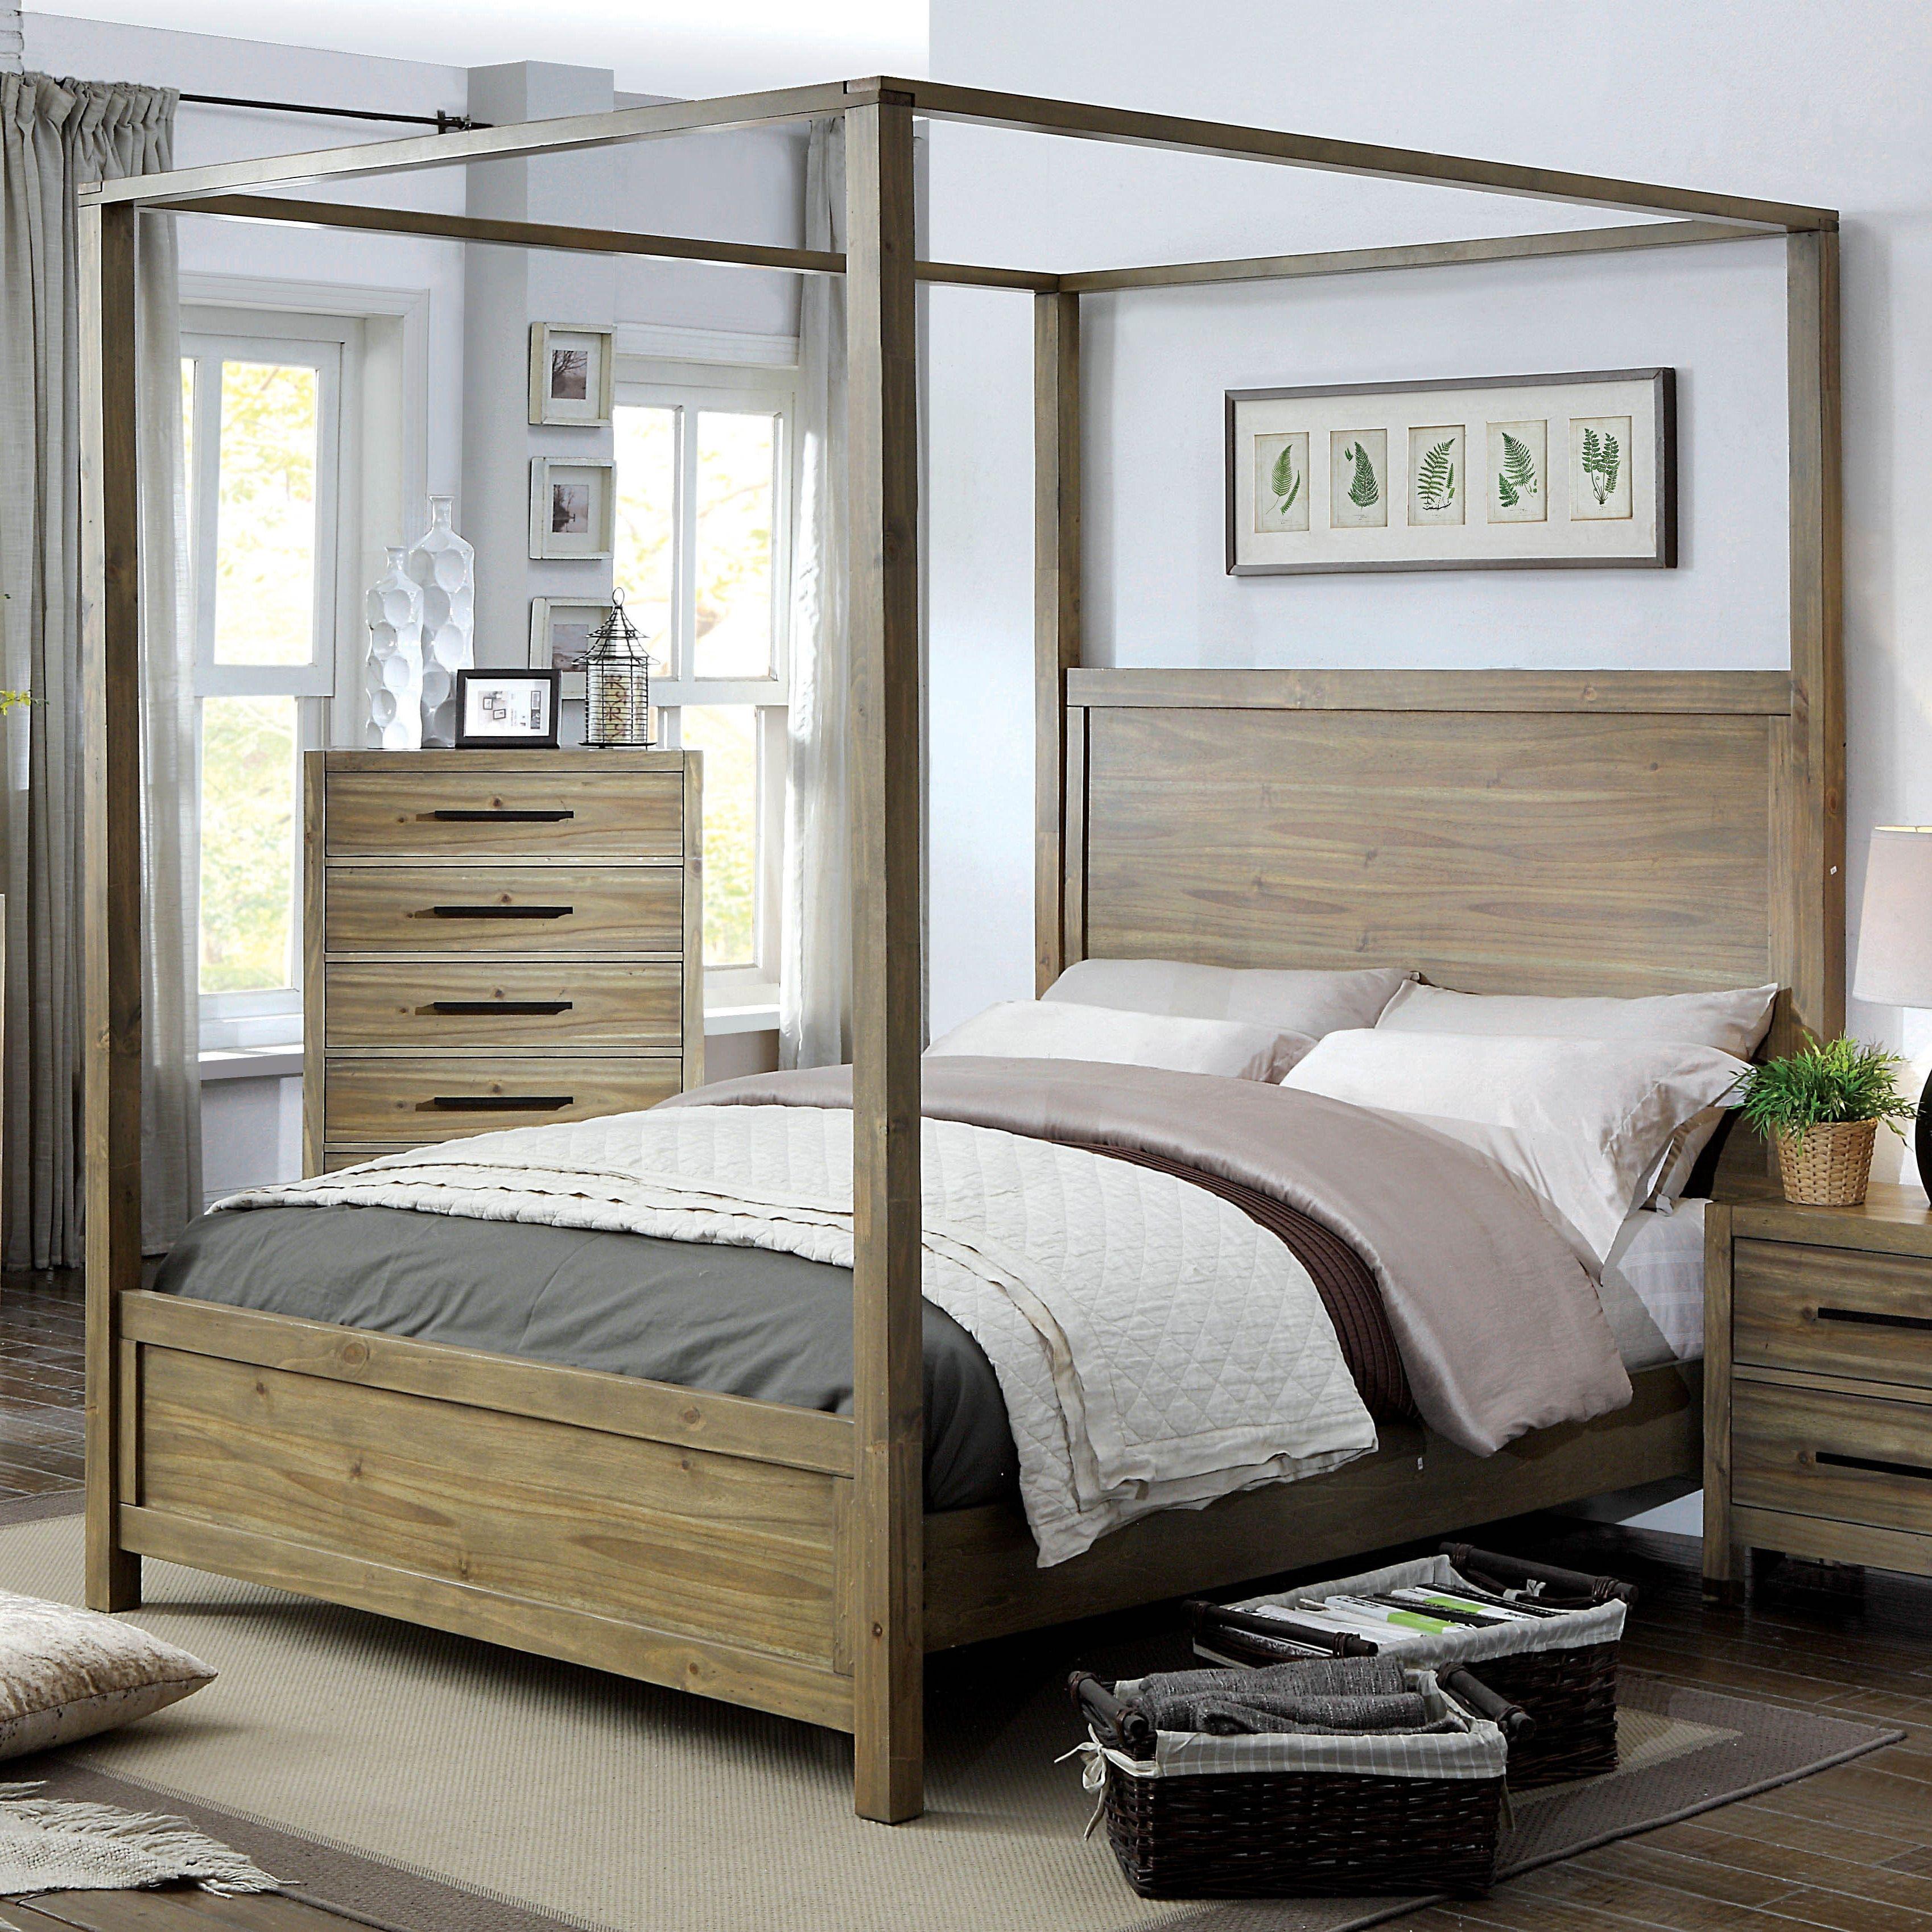 Furniture of America Holstead I Rustic Light Oak Wooden